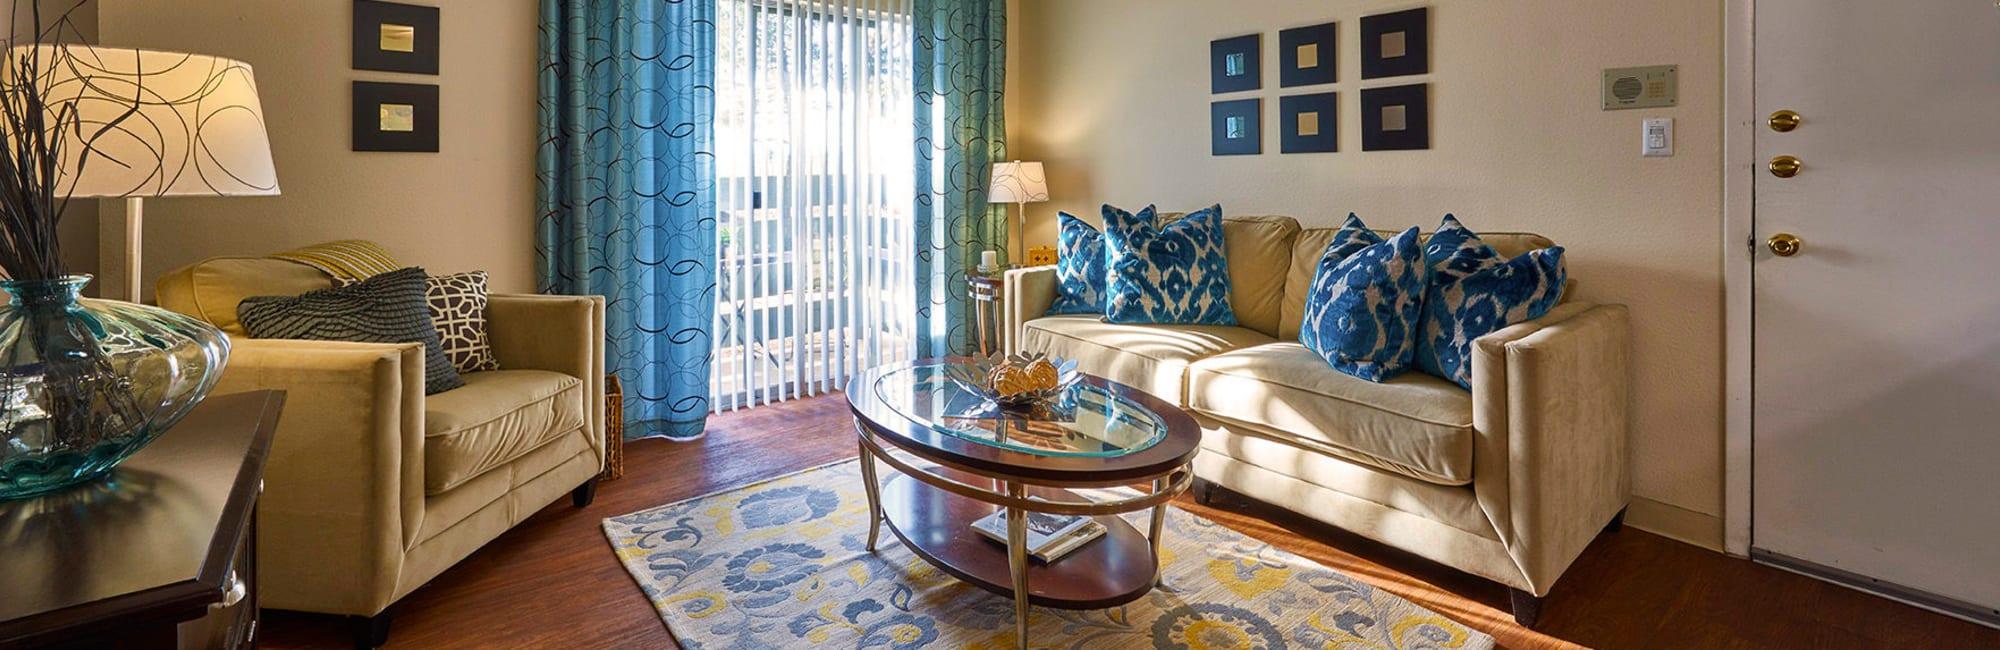 Denver, Colorado, apartments at Hampden Heights Apartments